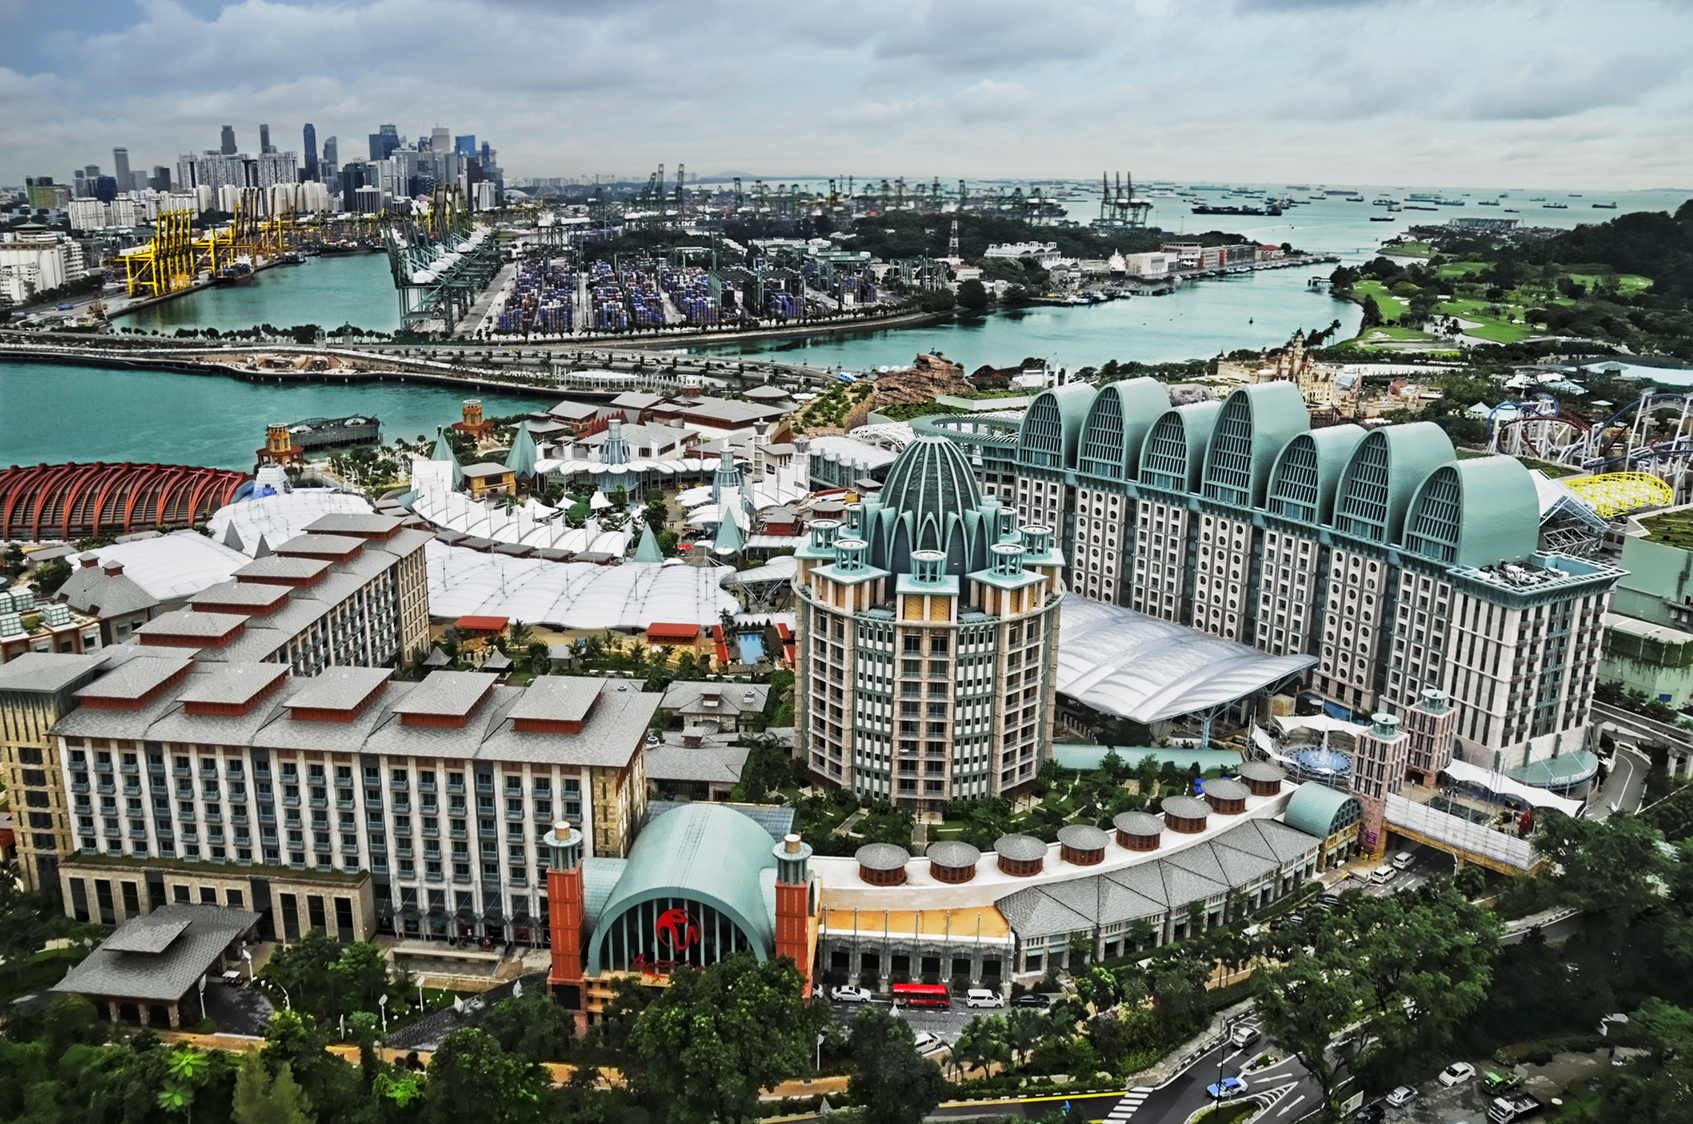 Resorts World Sentosa viewed from the Tiger Sky Tower, Sentosa, Singapore - 20110131.jpg